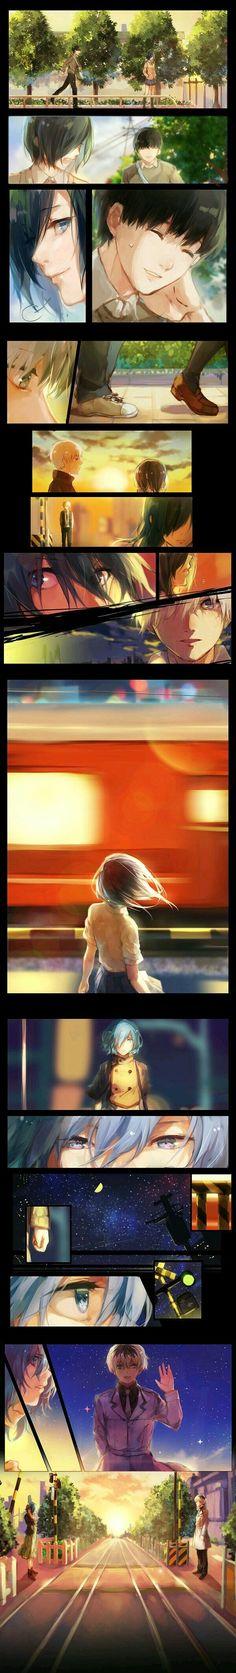 Tokyo Ghould - kaneki x Touka... http://xn--80akibjkfl0bs.xn--p1acf/2017/02/01/tokyo-ghould-kaneki-x-touka/ #animegirl #animeeyes #animeimpulse #animech#ar#acters #animeh#aven #animew#all#aper #animetv #animemovies #animef#avor #anime#ames #anime #animememes #animeexpo #animedr#awings #ani#art #ani#av#at#arcr#ator #ani#angel #ani#ani#als #ani#aw#ards #ani#app #ani#another #ani#amino #ani#aesthetic #ani#amer#a #animeboy #animech#ar#acter #animegirl#ame #animerecomme#ations #animegirl…